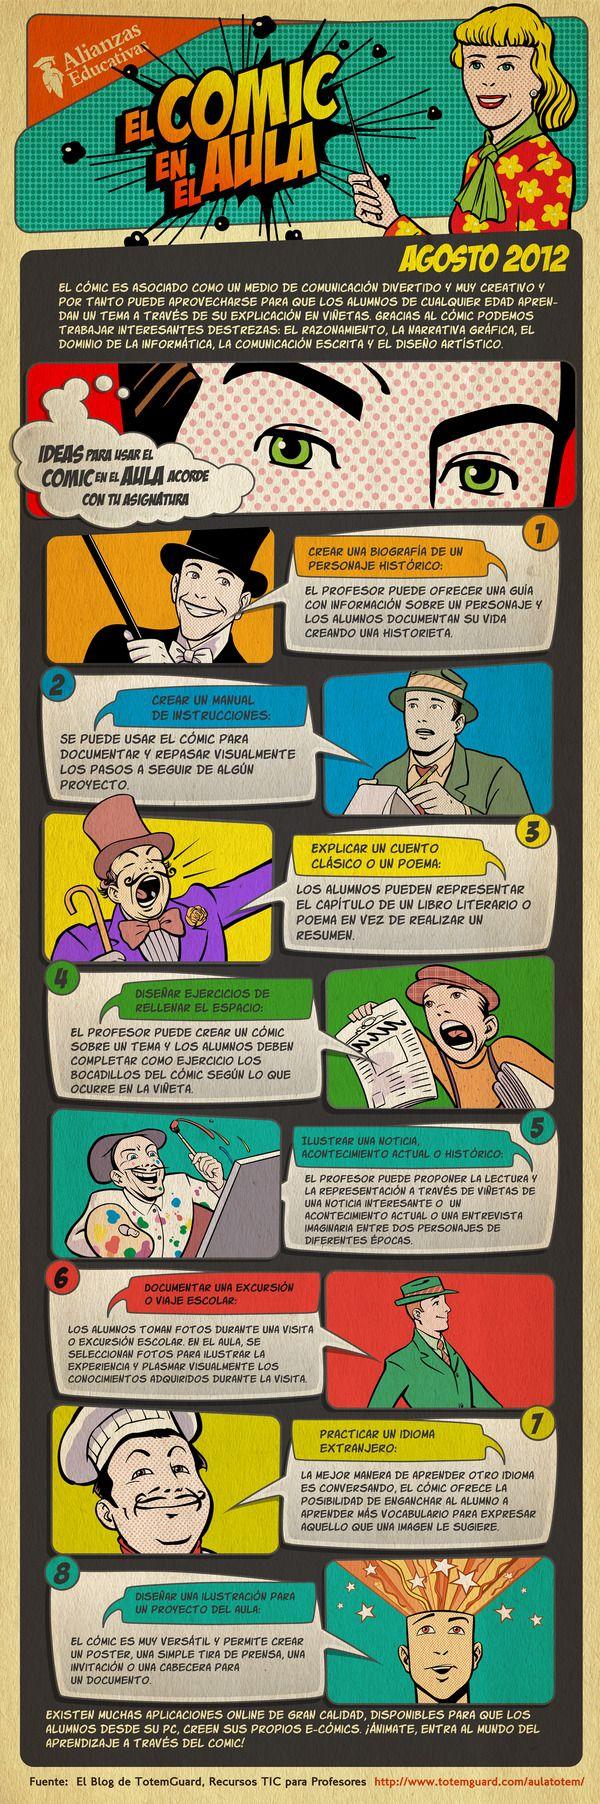 El cómic en el aula #infografia #infographic #education